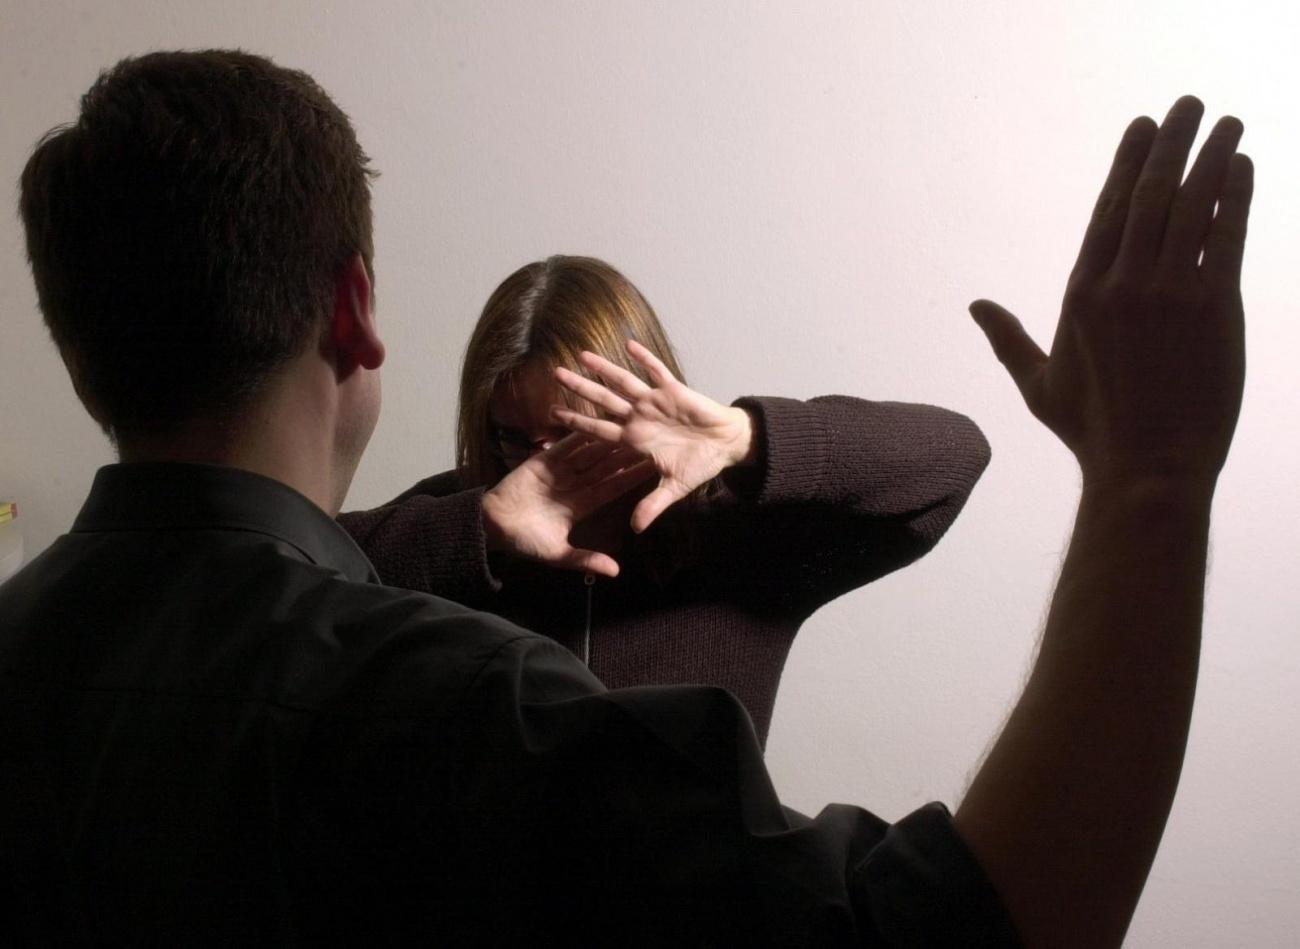 муж жену пальцами-щп1